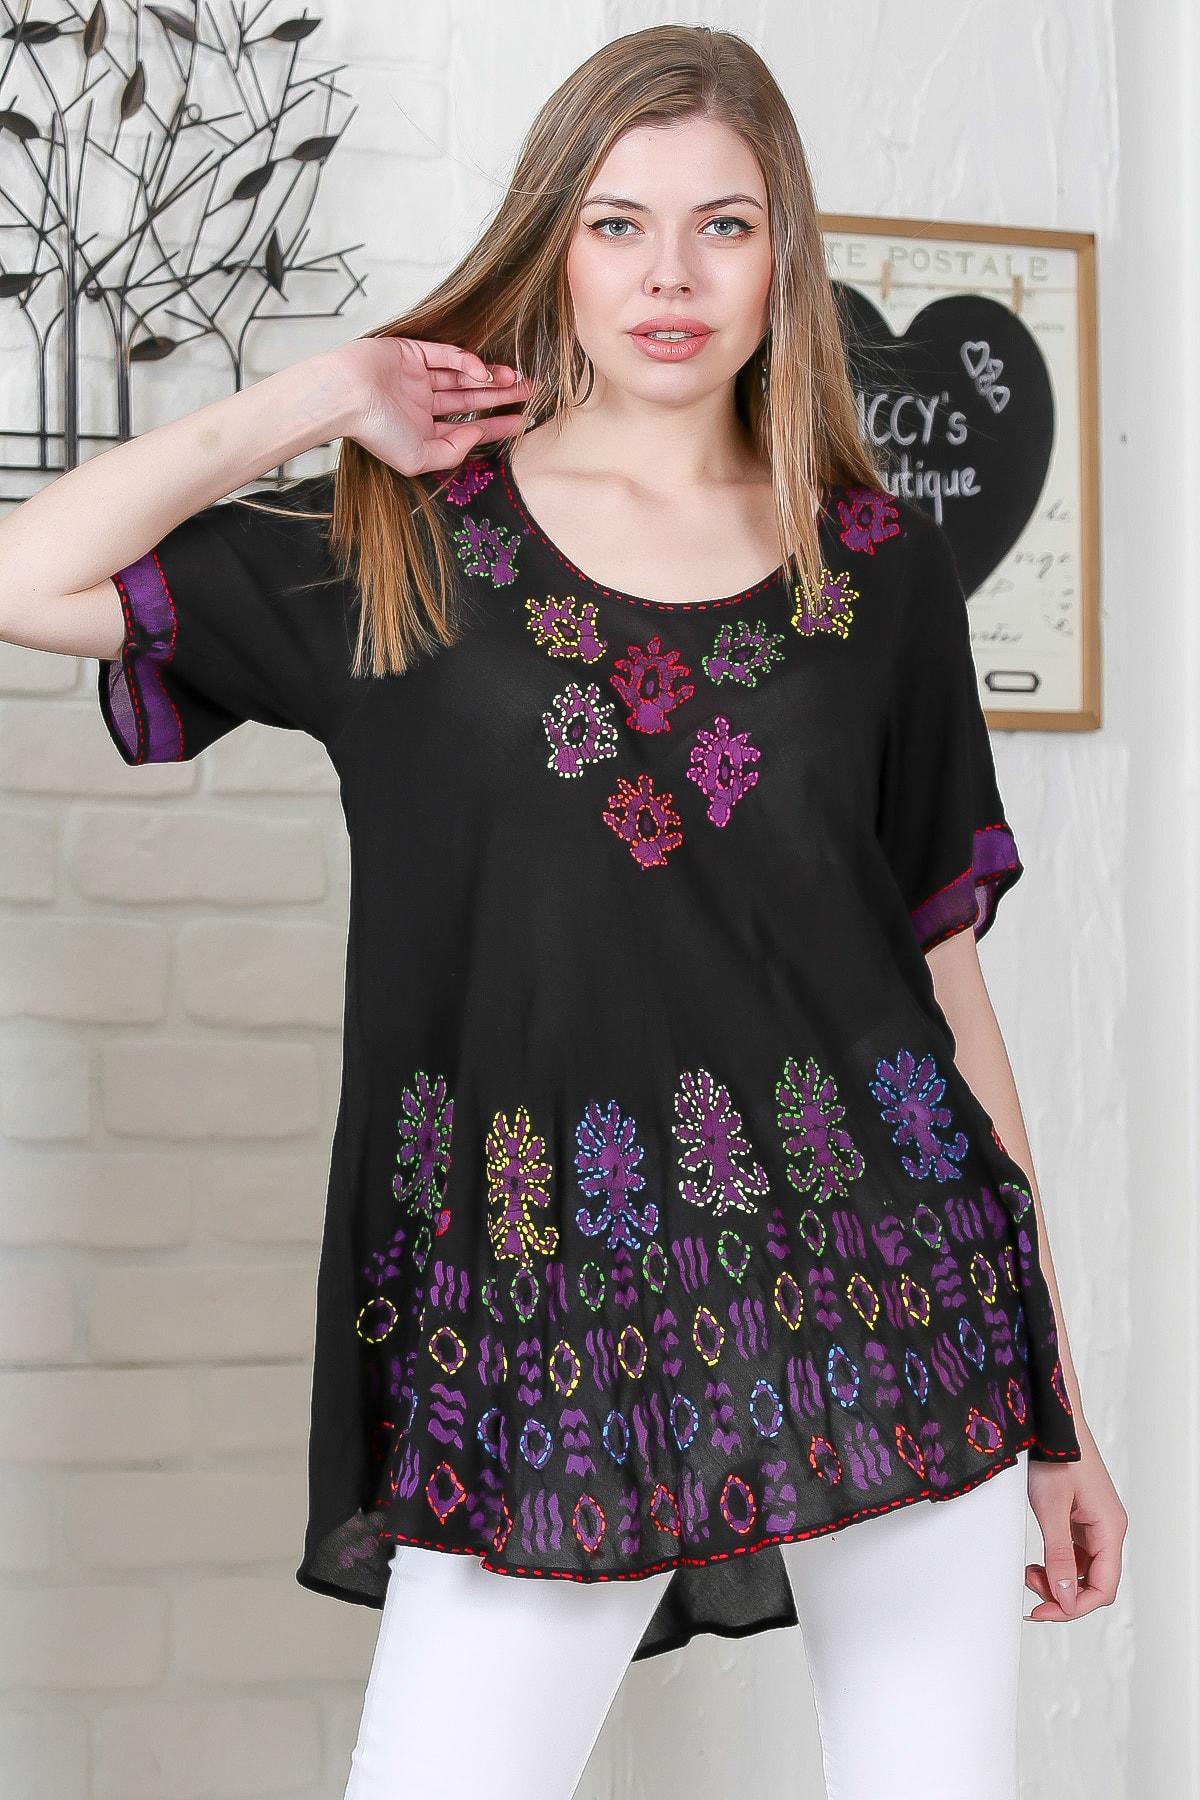 Chiccy Kadın Siyah Çiçek Baskılı Nakış Dikişli Kısa Kol Batik Salaş Dokuma Bluz M10010200BL95495 2